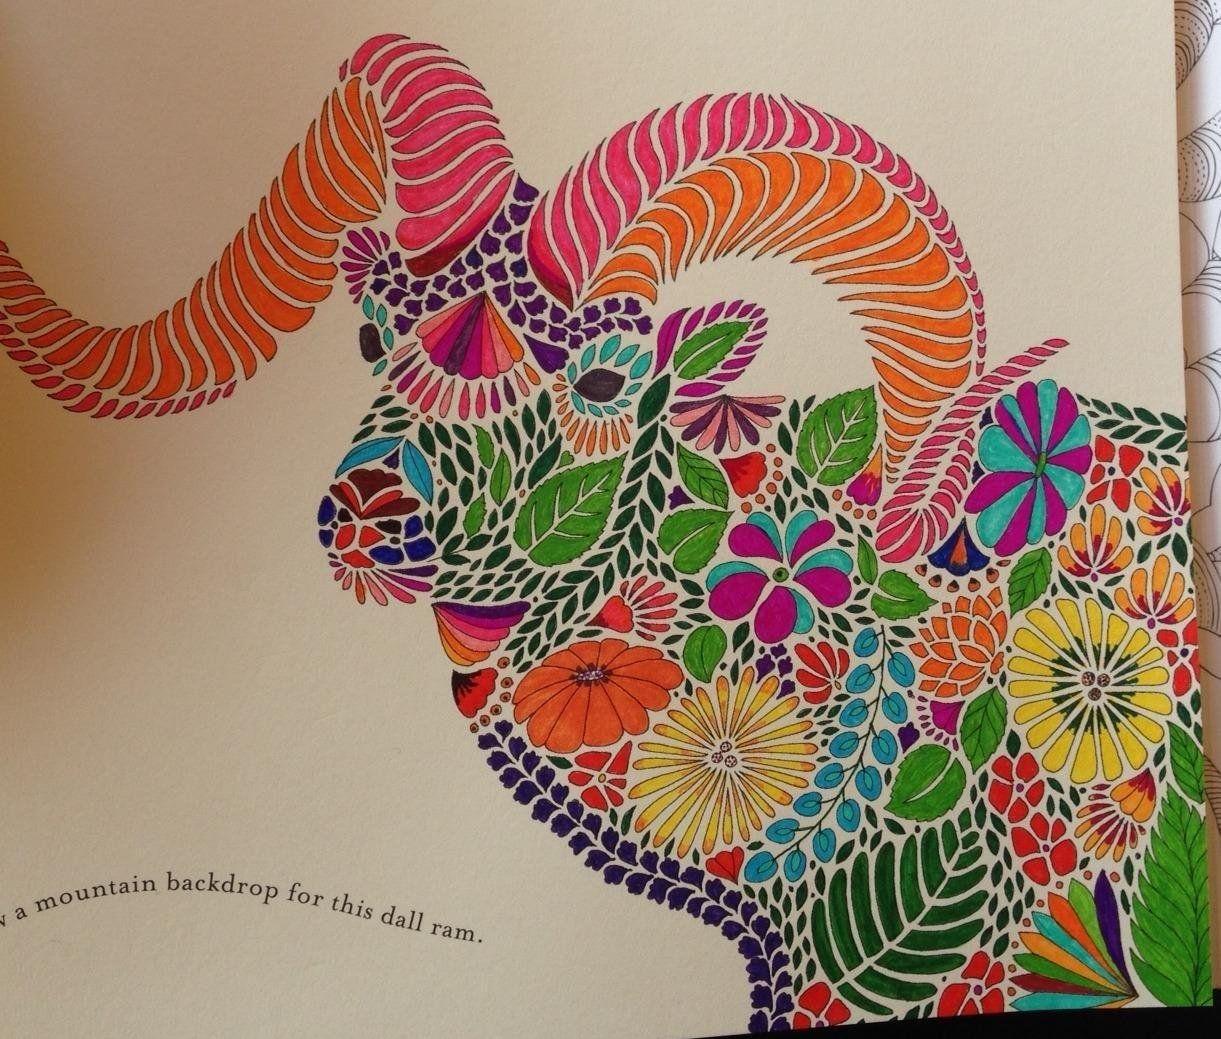 Color me draw me animal kingdom book - Millie Marotta S Animal Kingdom A Colouring Book Adventure Amazon Co Uk